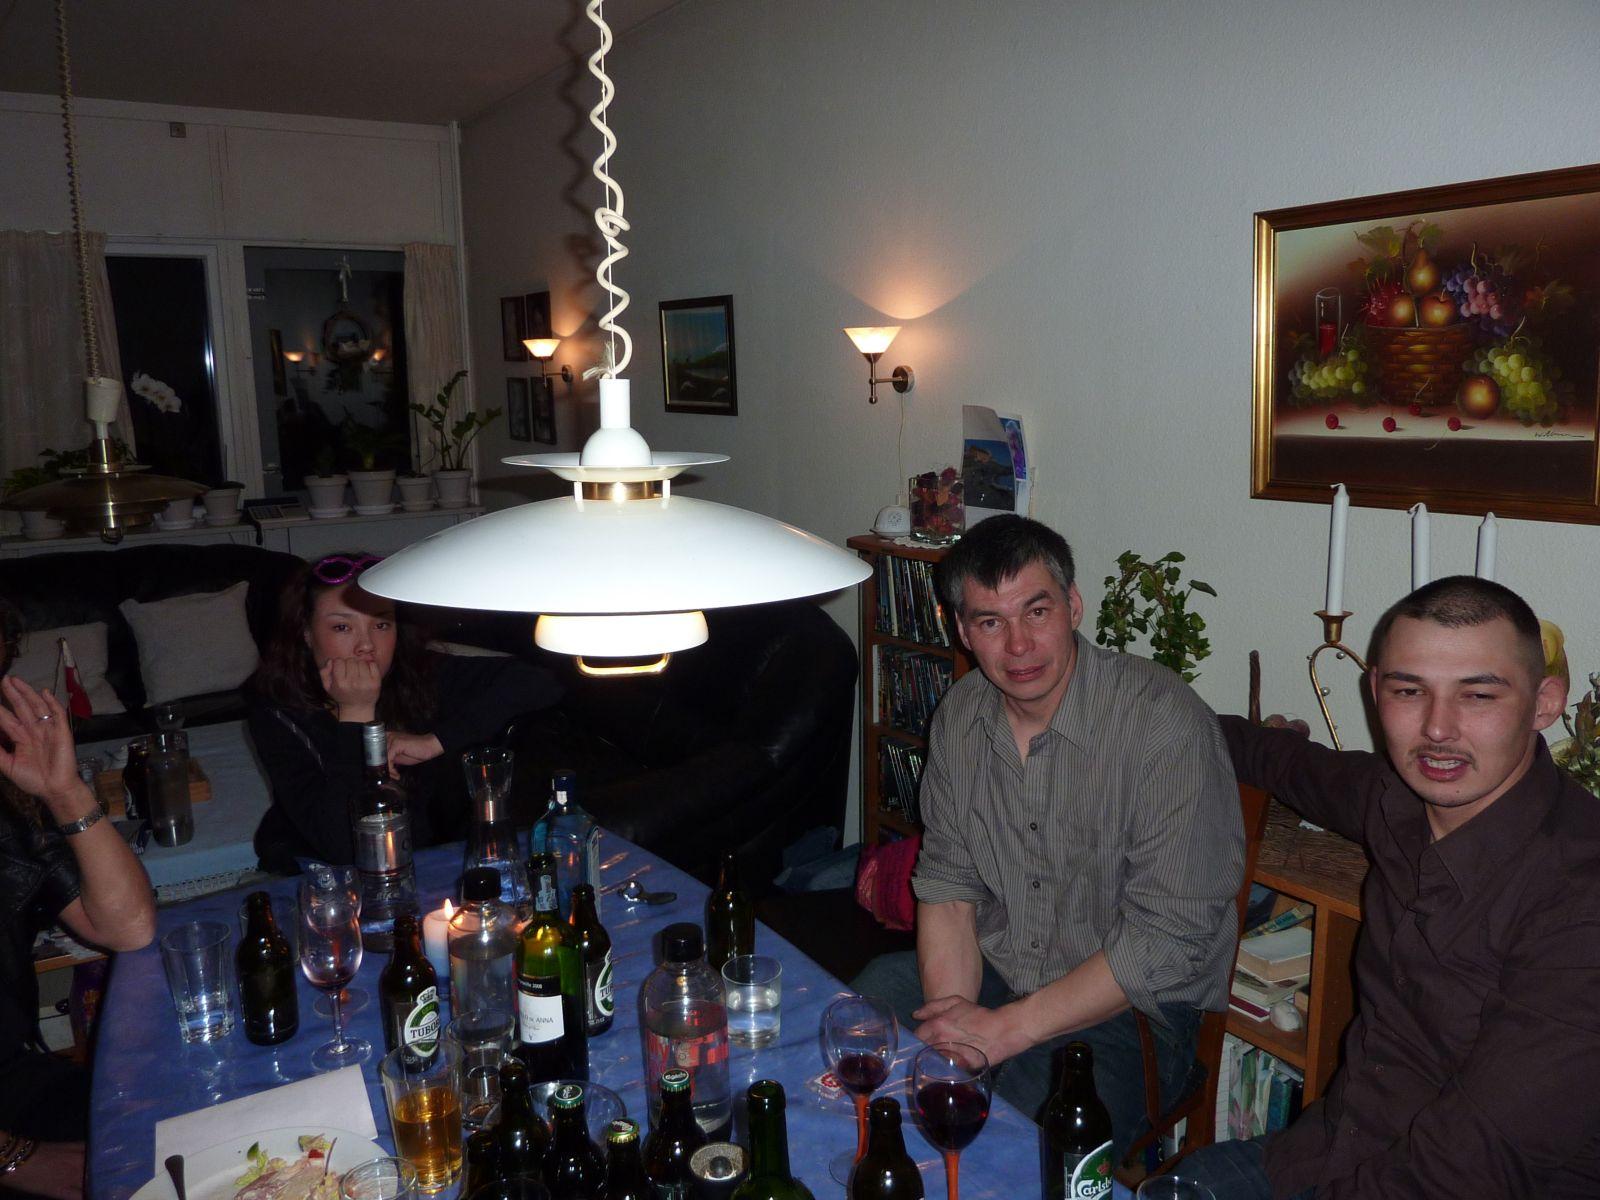 2010-03-14-0311_-_Jens Larsen; Peter_